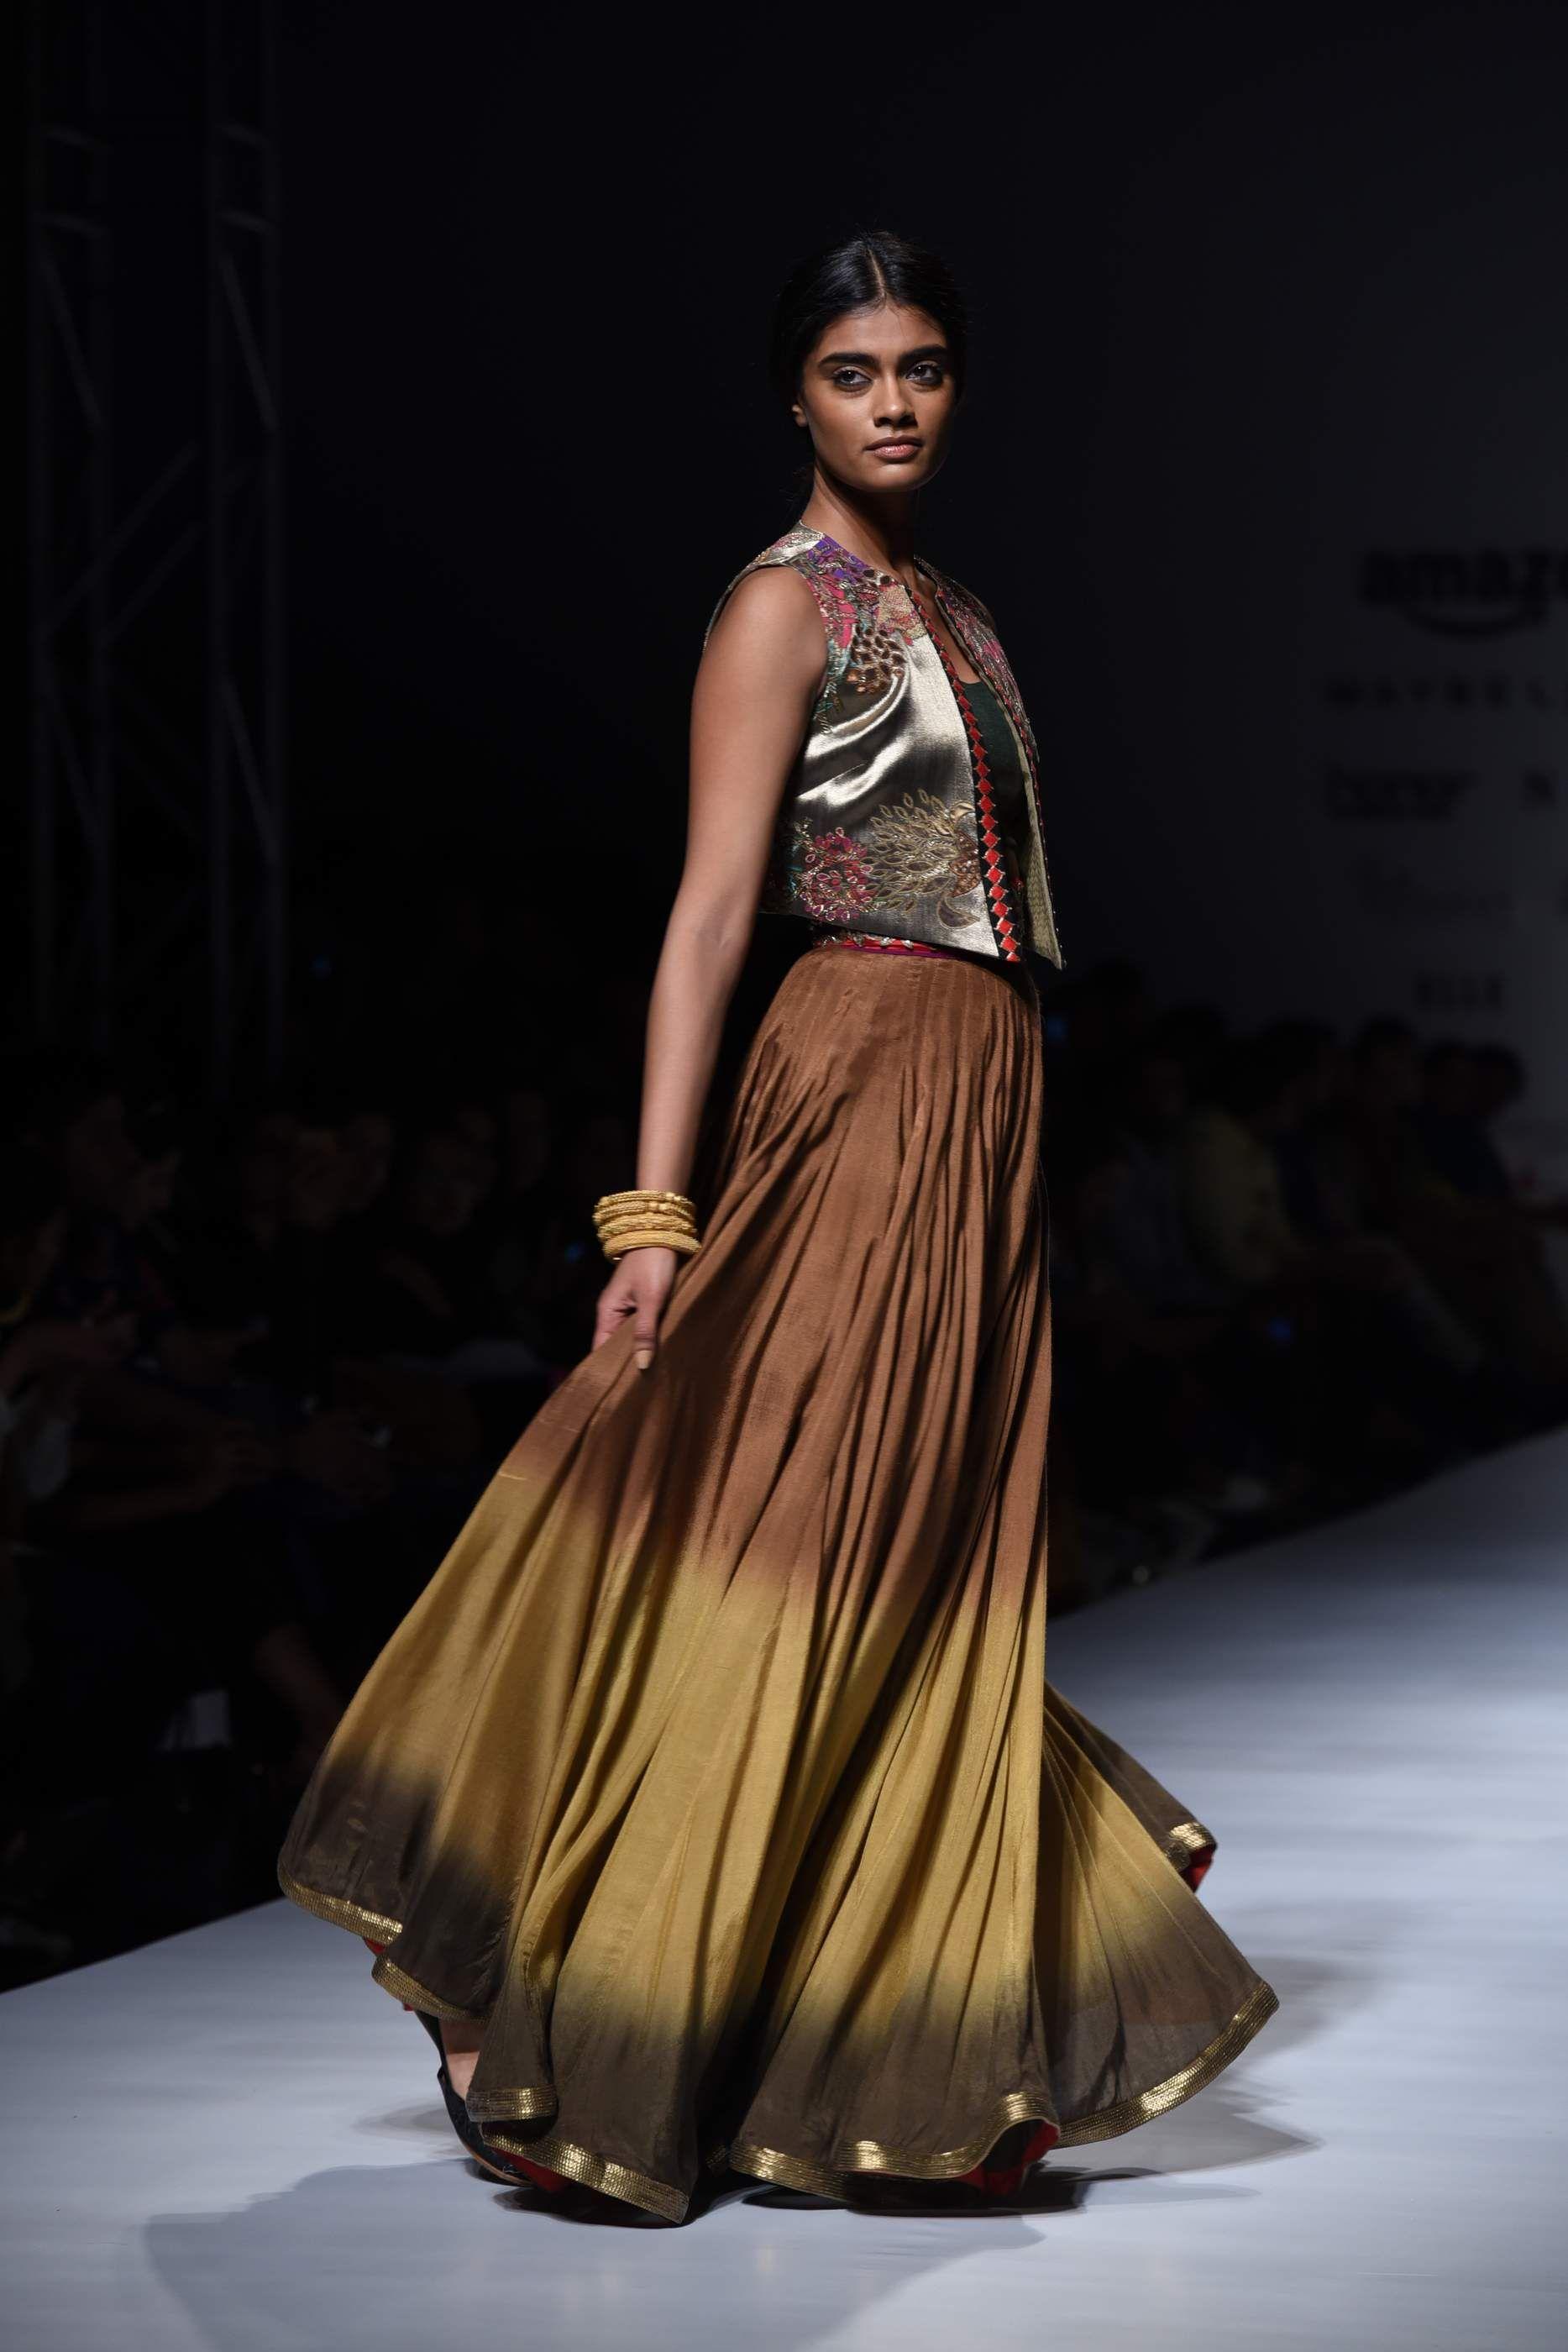 Krishnamehra runway afw indianwear indianfashion